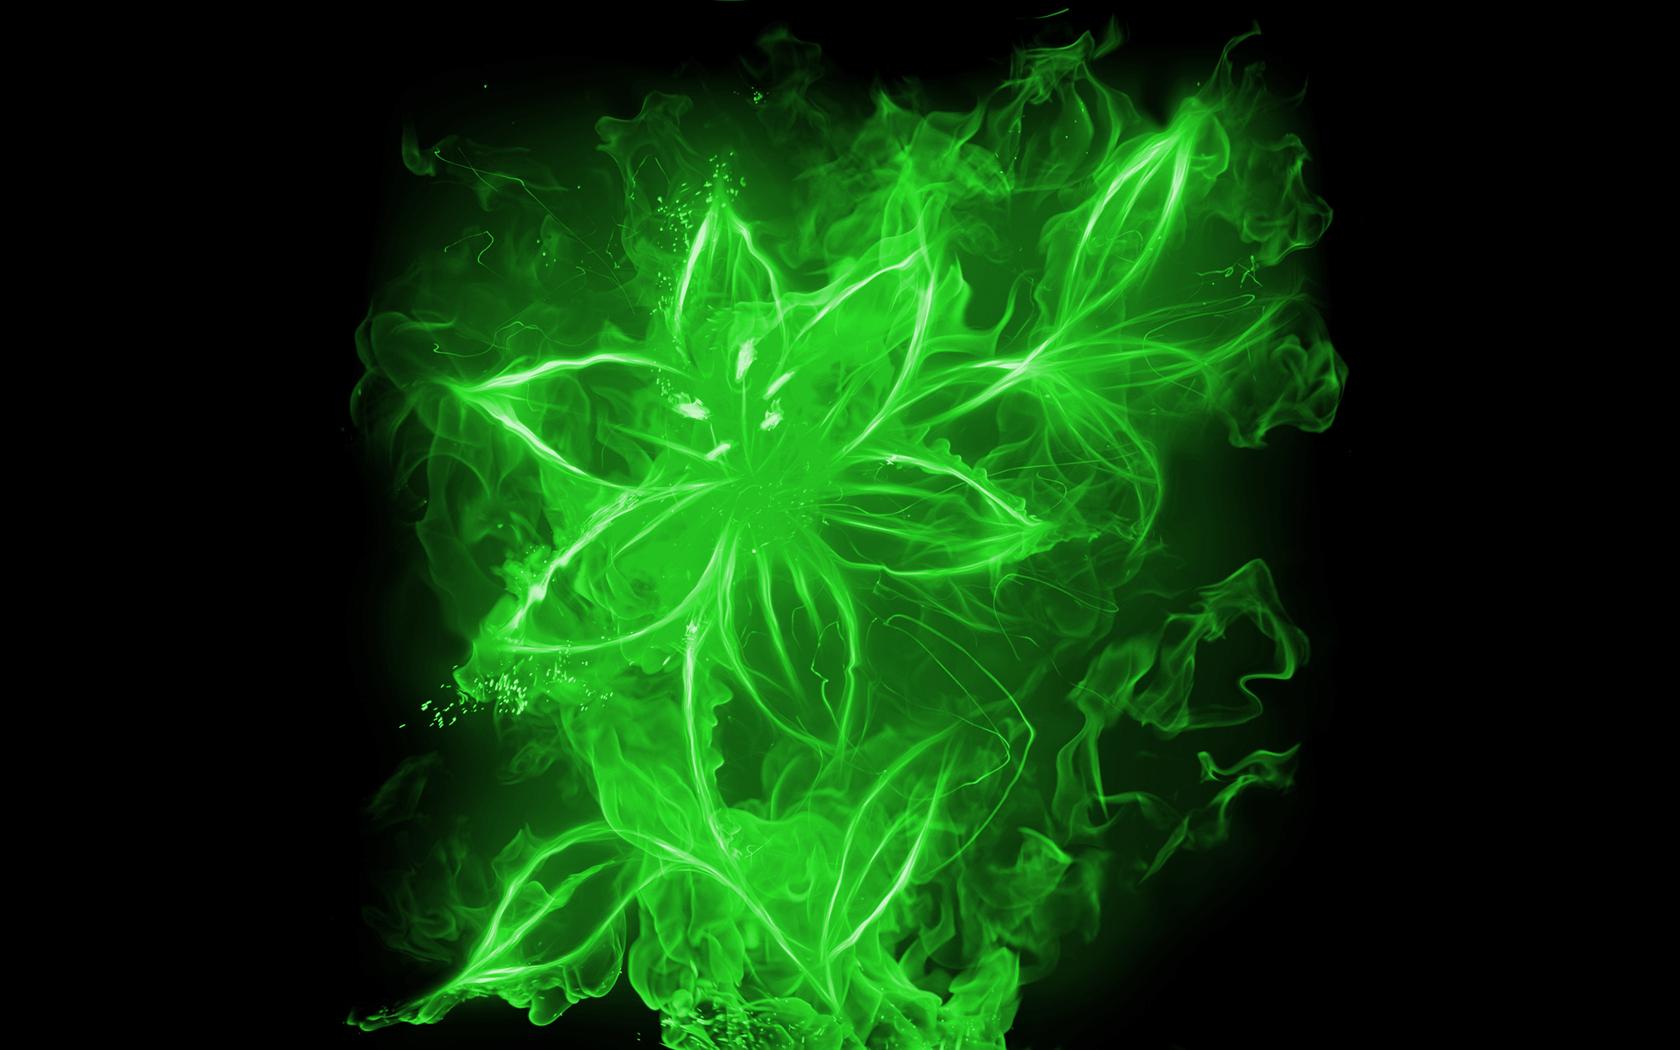 Fondo negro y flores verdes 3D - 1680x1050